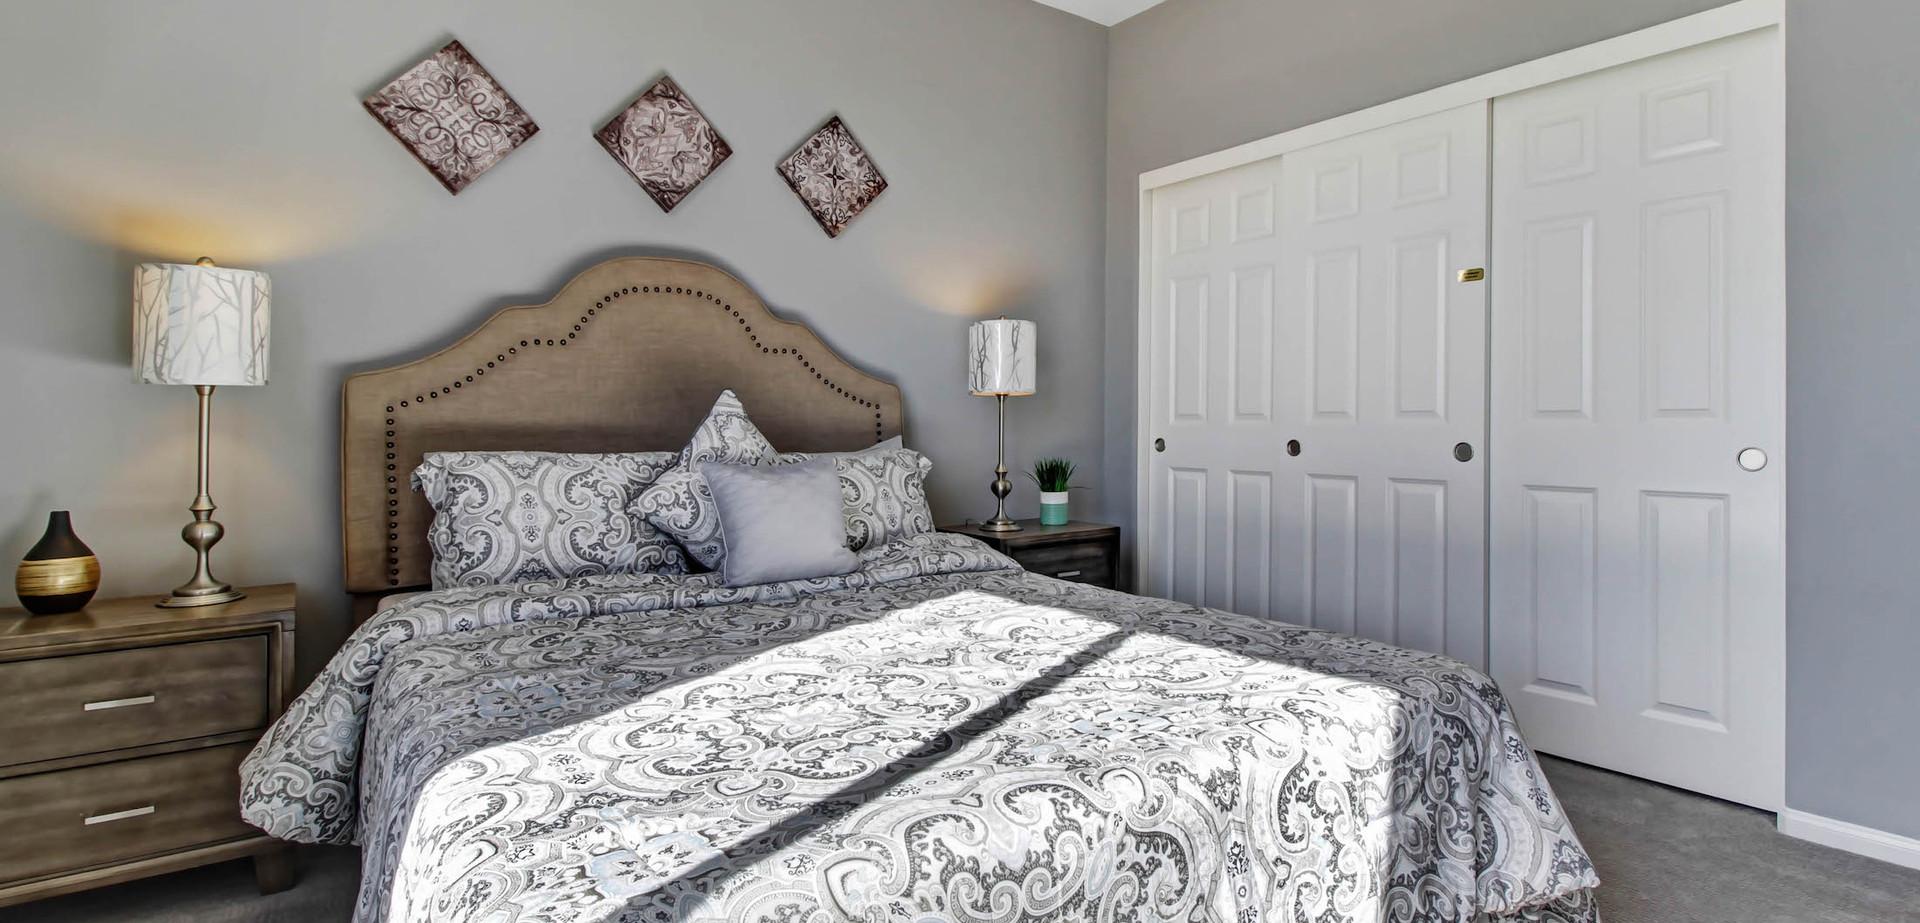 model-1 bedroom-2 2200x1500.jpg